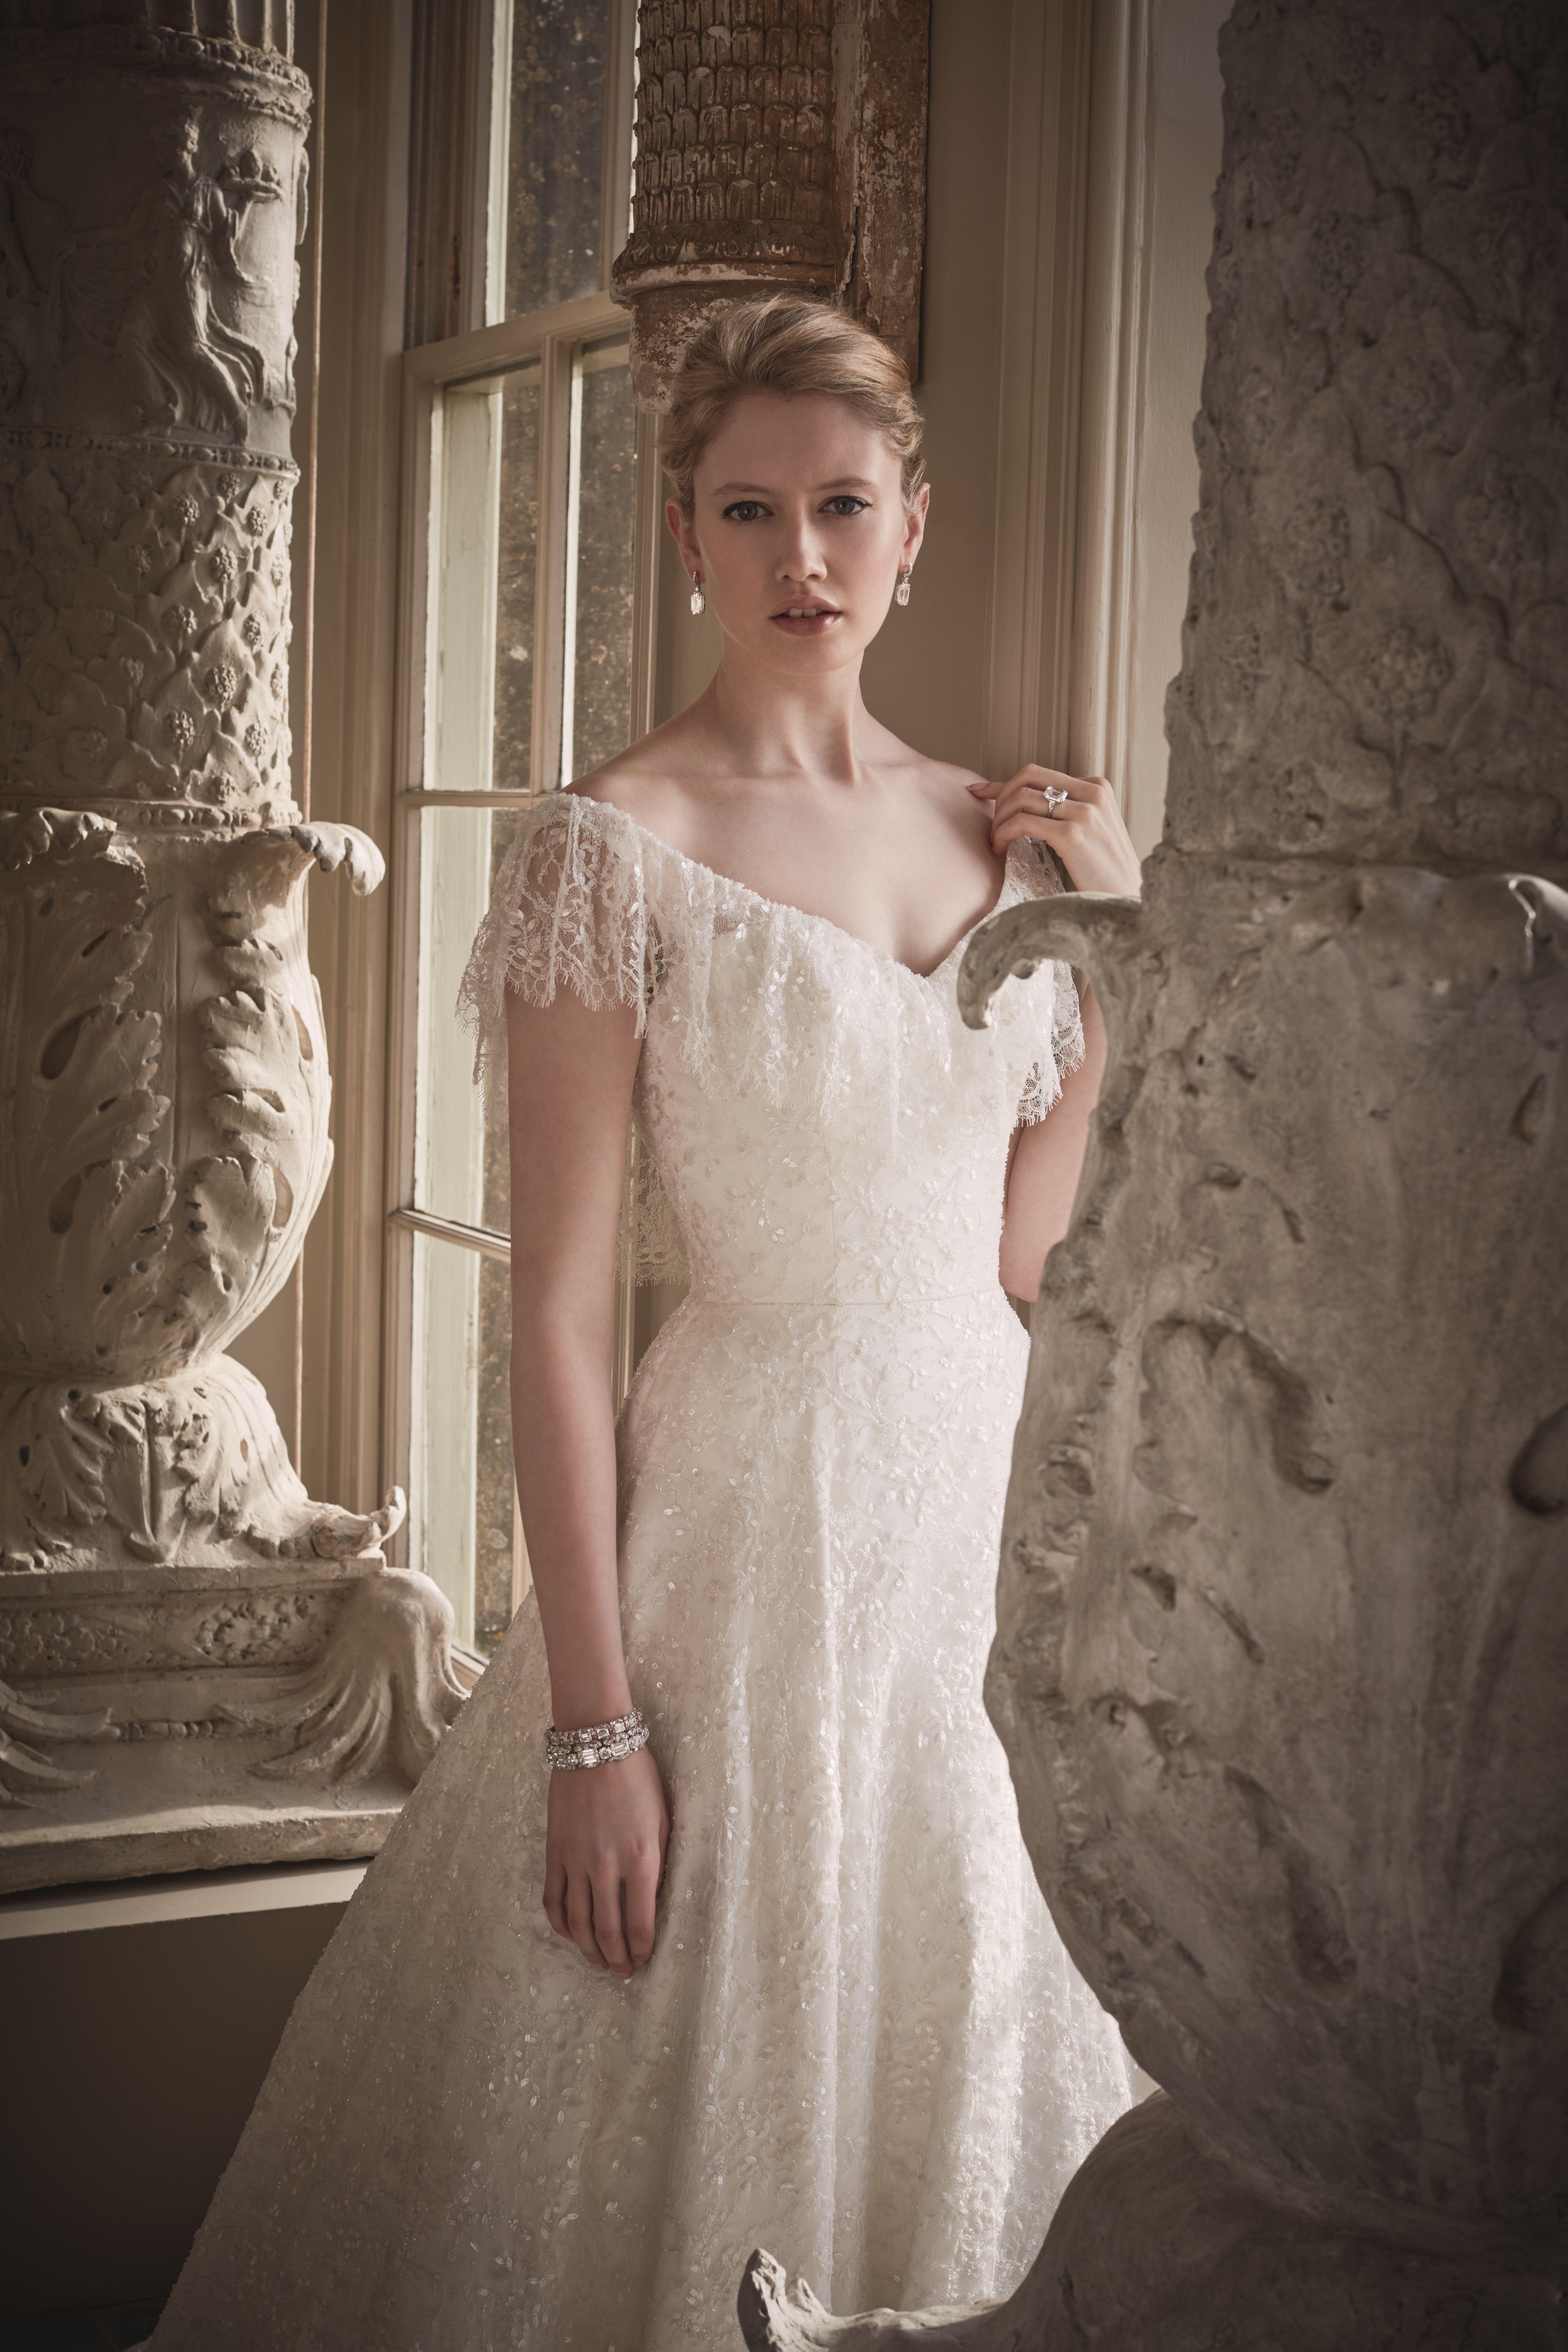 Phillipa Lepley Couture Wedding Dress London Uk Designer Bespoke Couture Alice Wedding Dress Couture Wedding Dress Necklines British Wedding Dresses